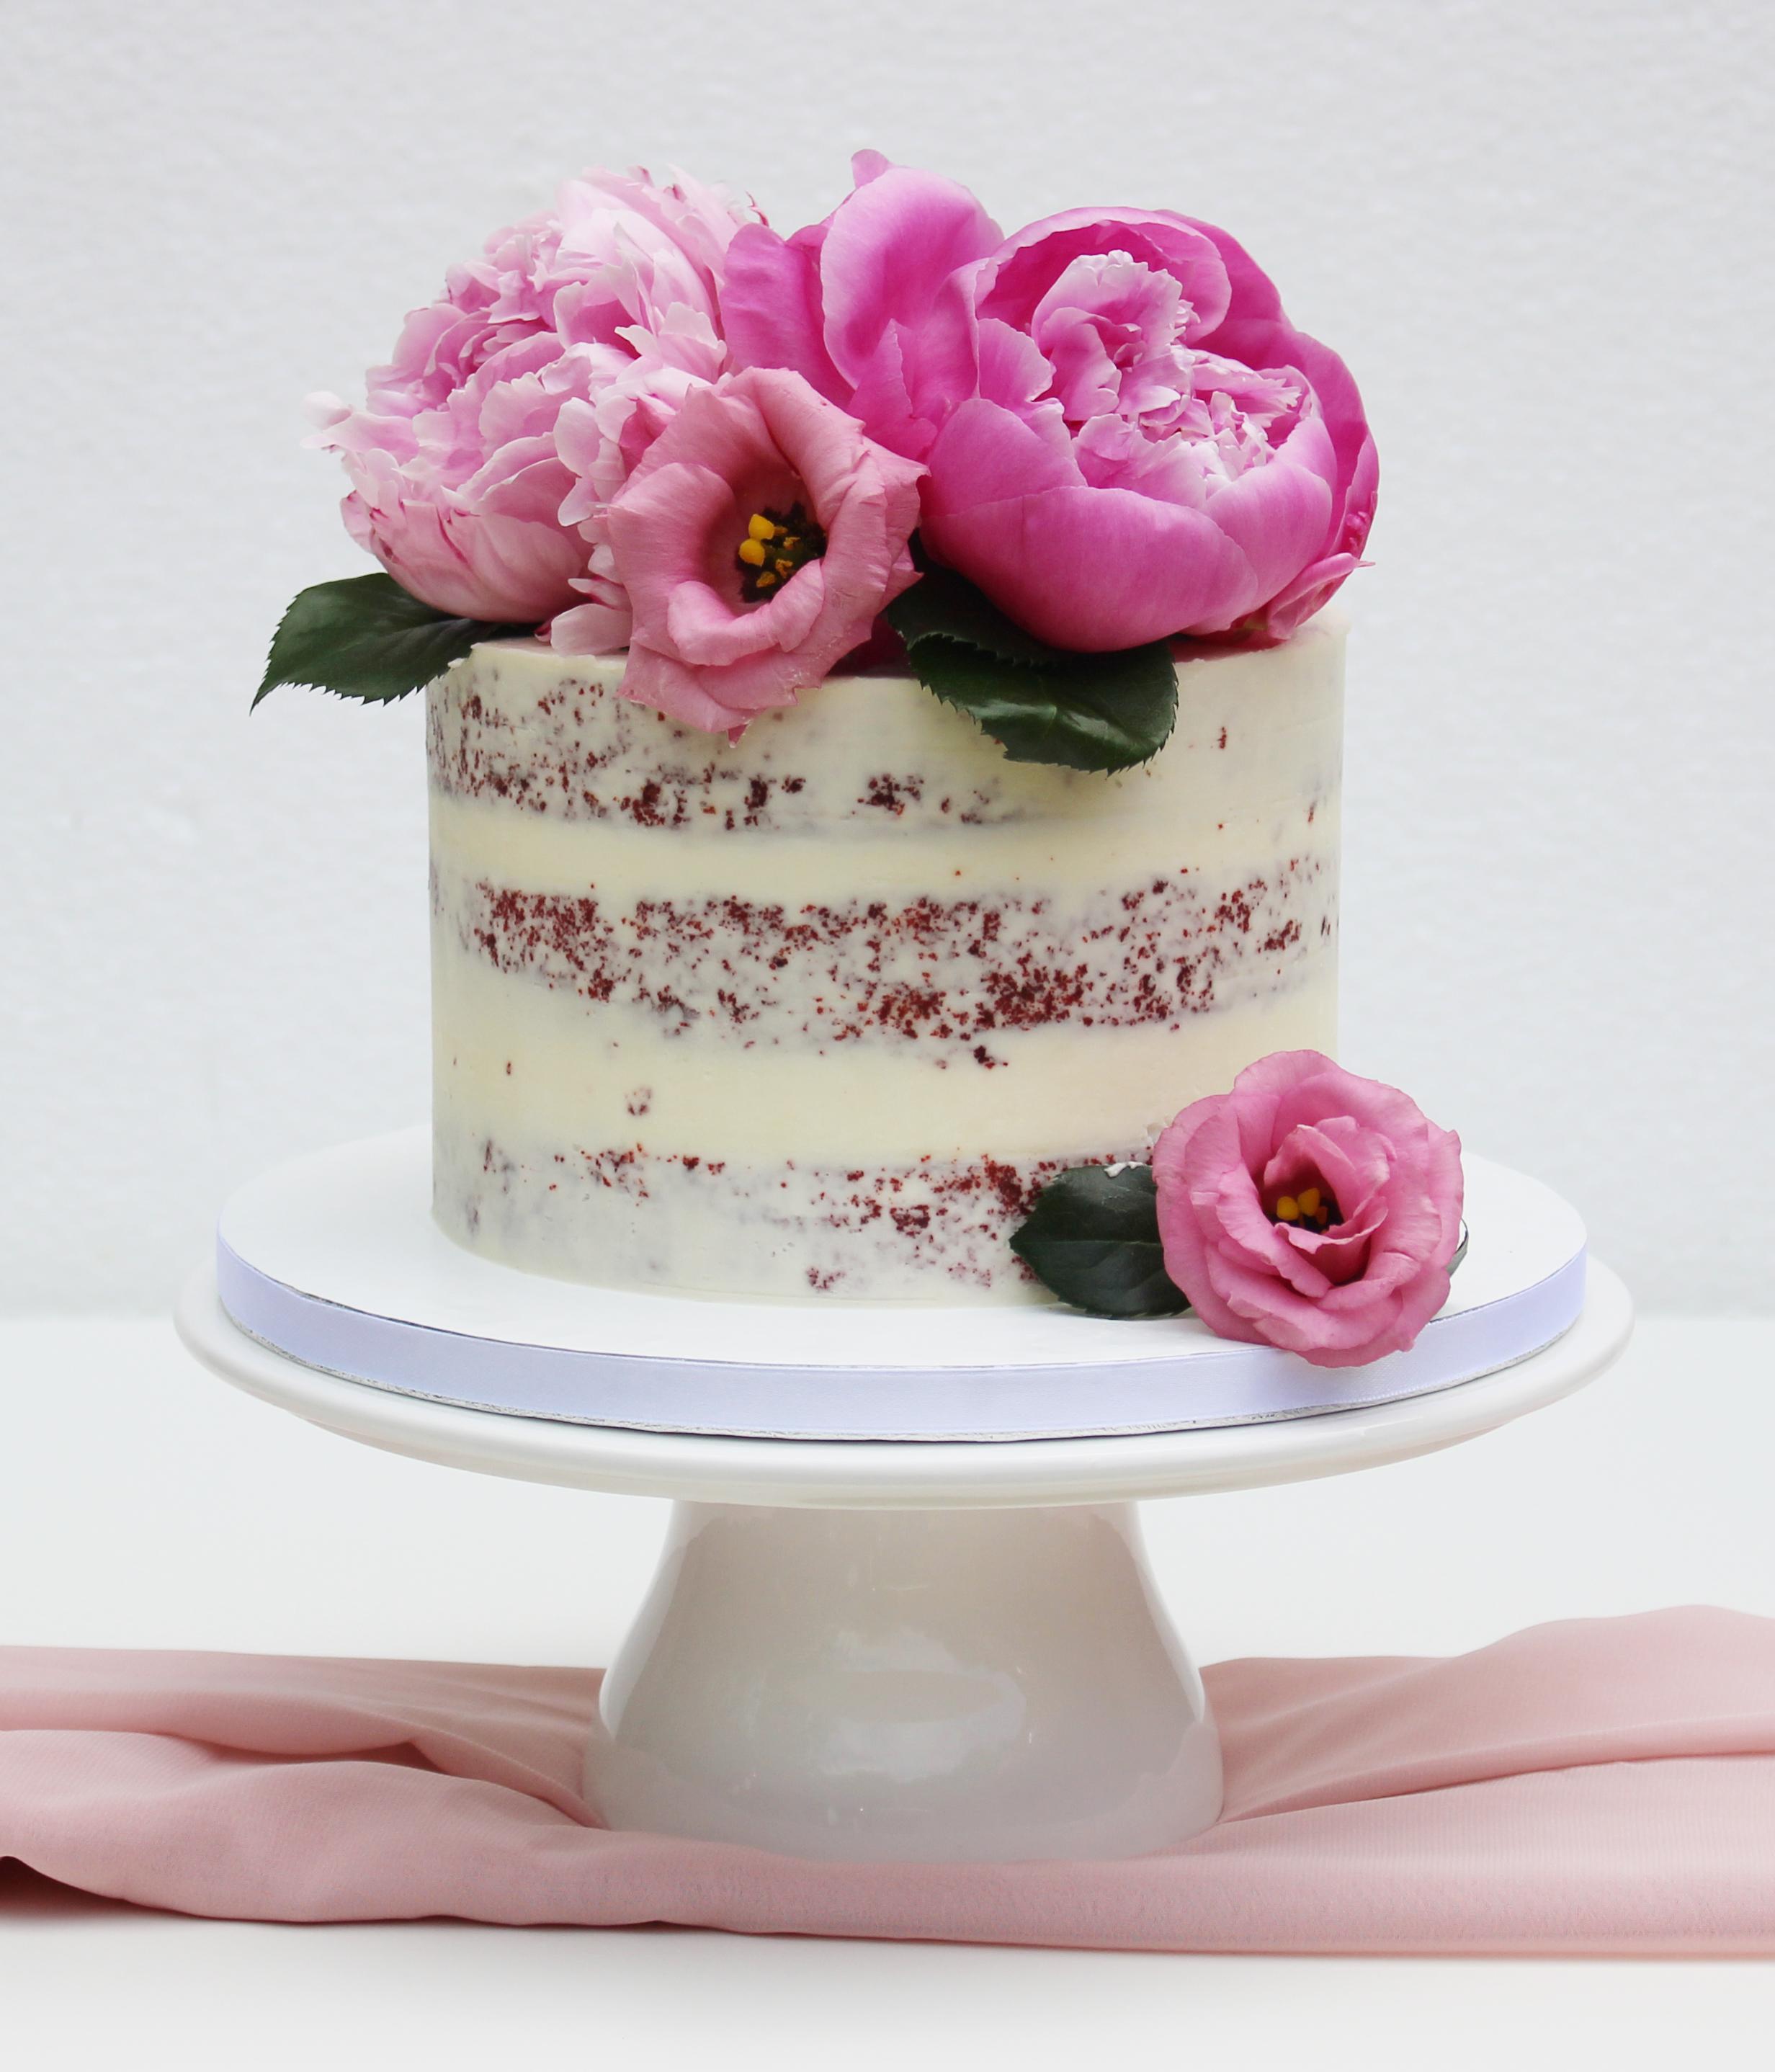 Spiksplinternieuw Semi-naked cake met bloemen ML-38